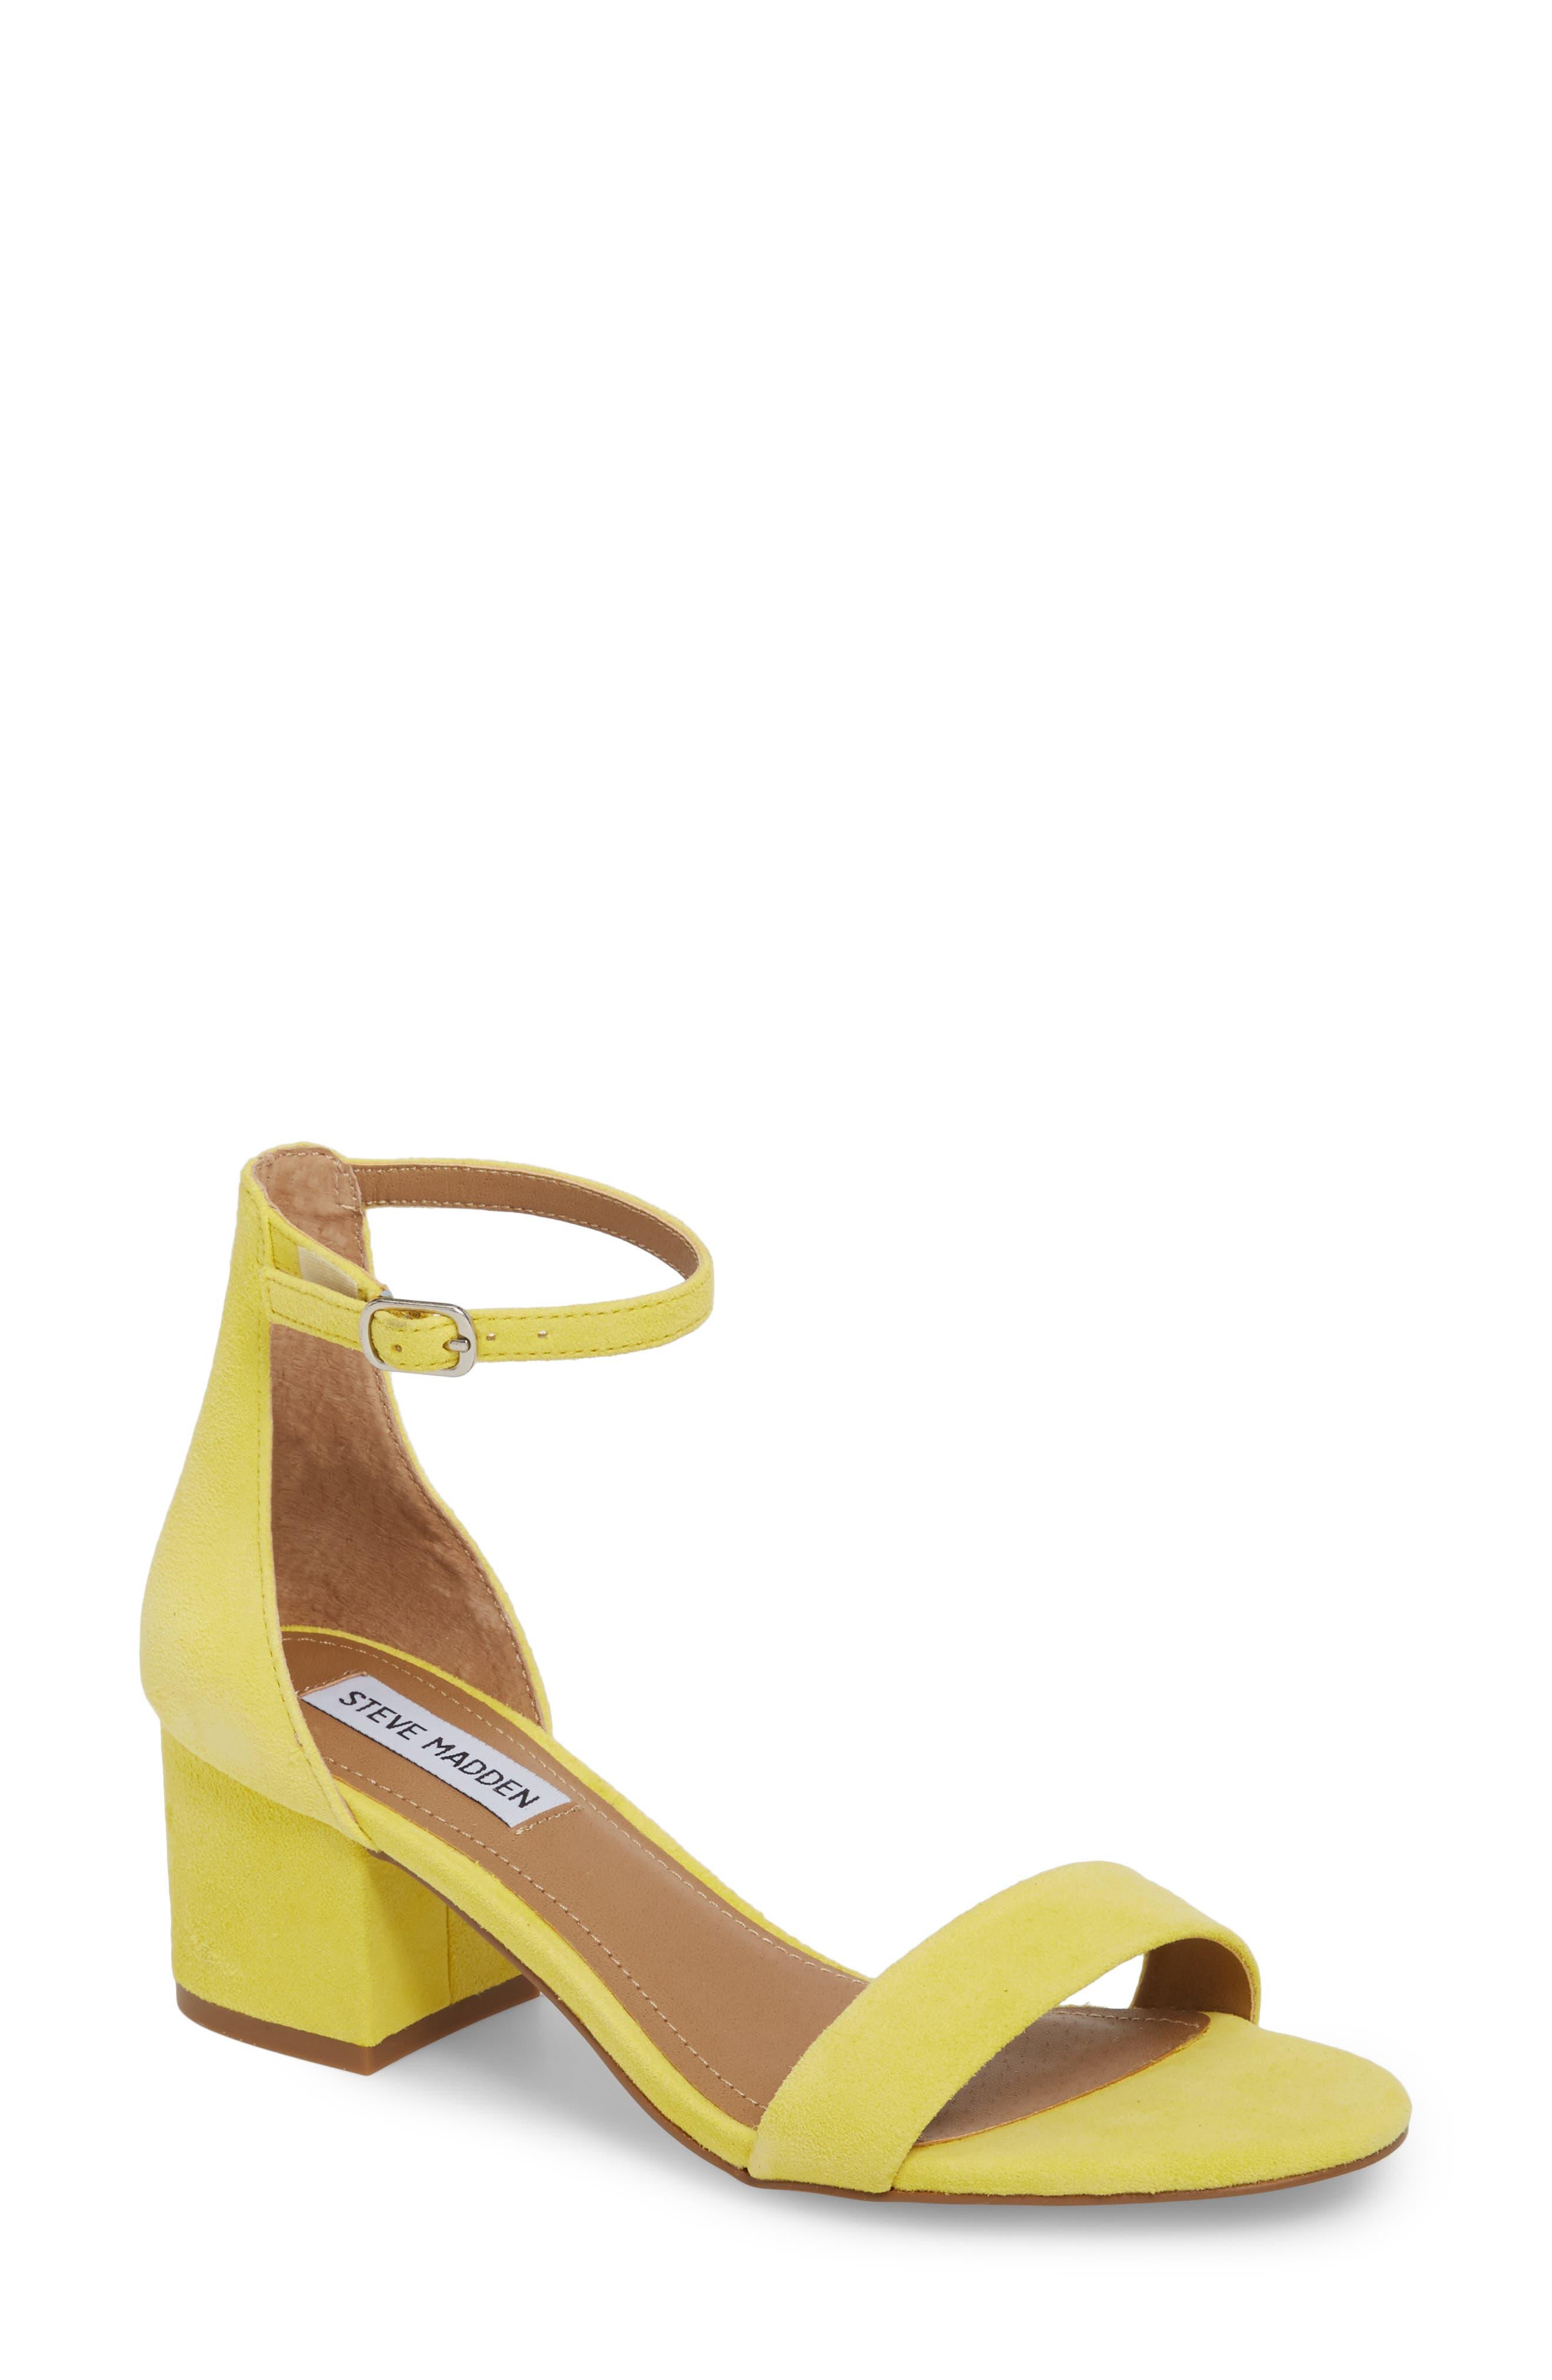 Irenee Ankle Strap Sandal,                             Main thumbnail 13, color,